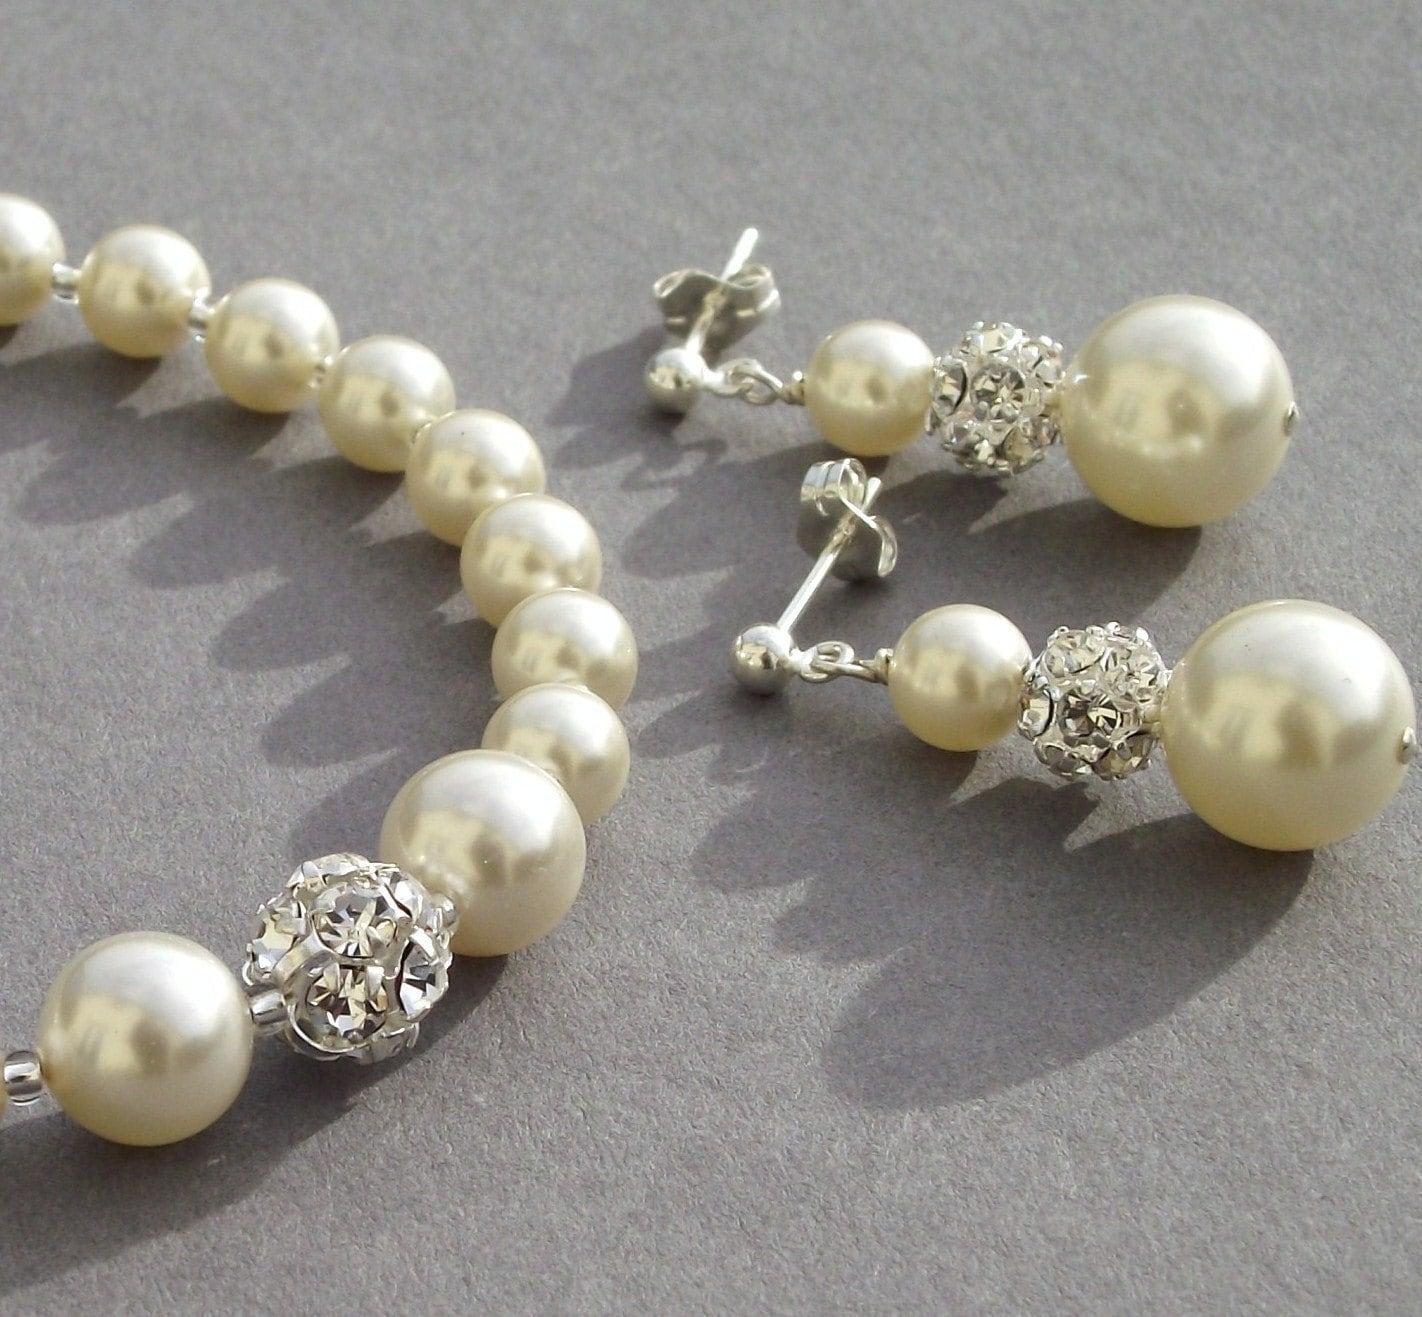 Bridal Pearl Bracelet and Earring Set